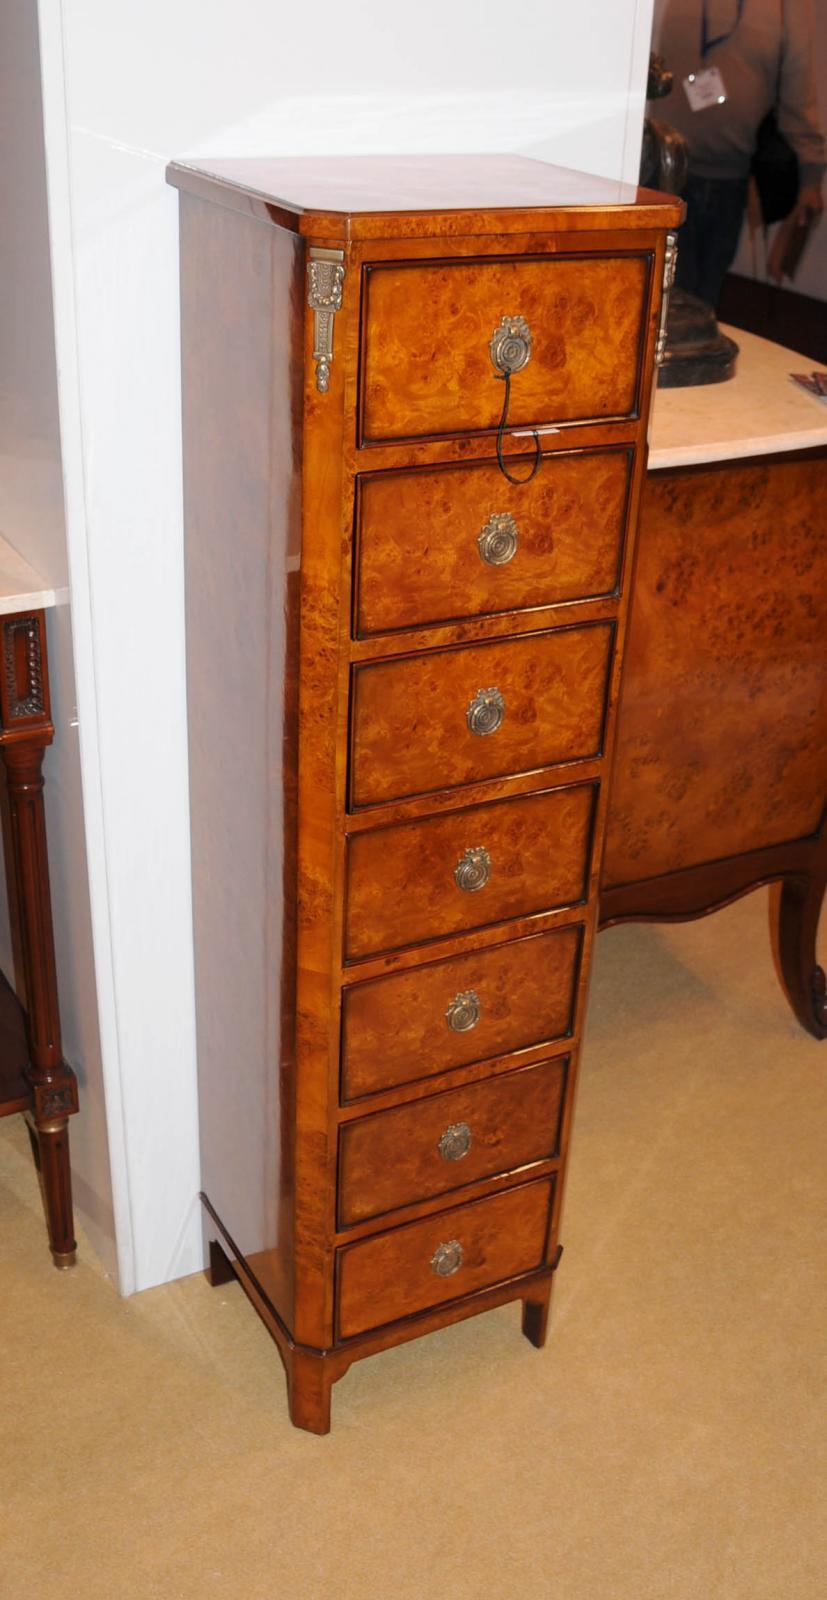 regency walnut lingerie commode chest drawers tall boy ebay. Black Bedroom Furniture Sets. Home Design Ideas